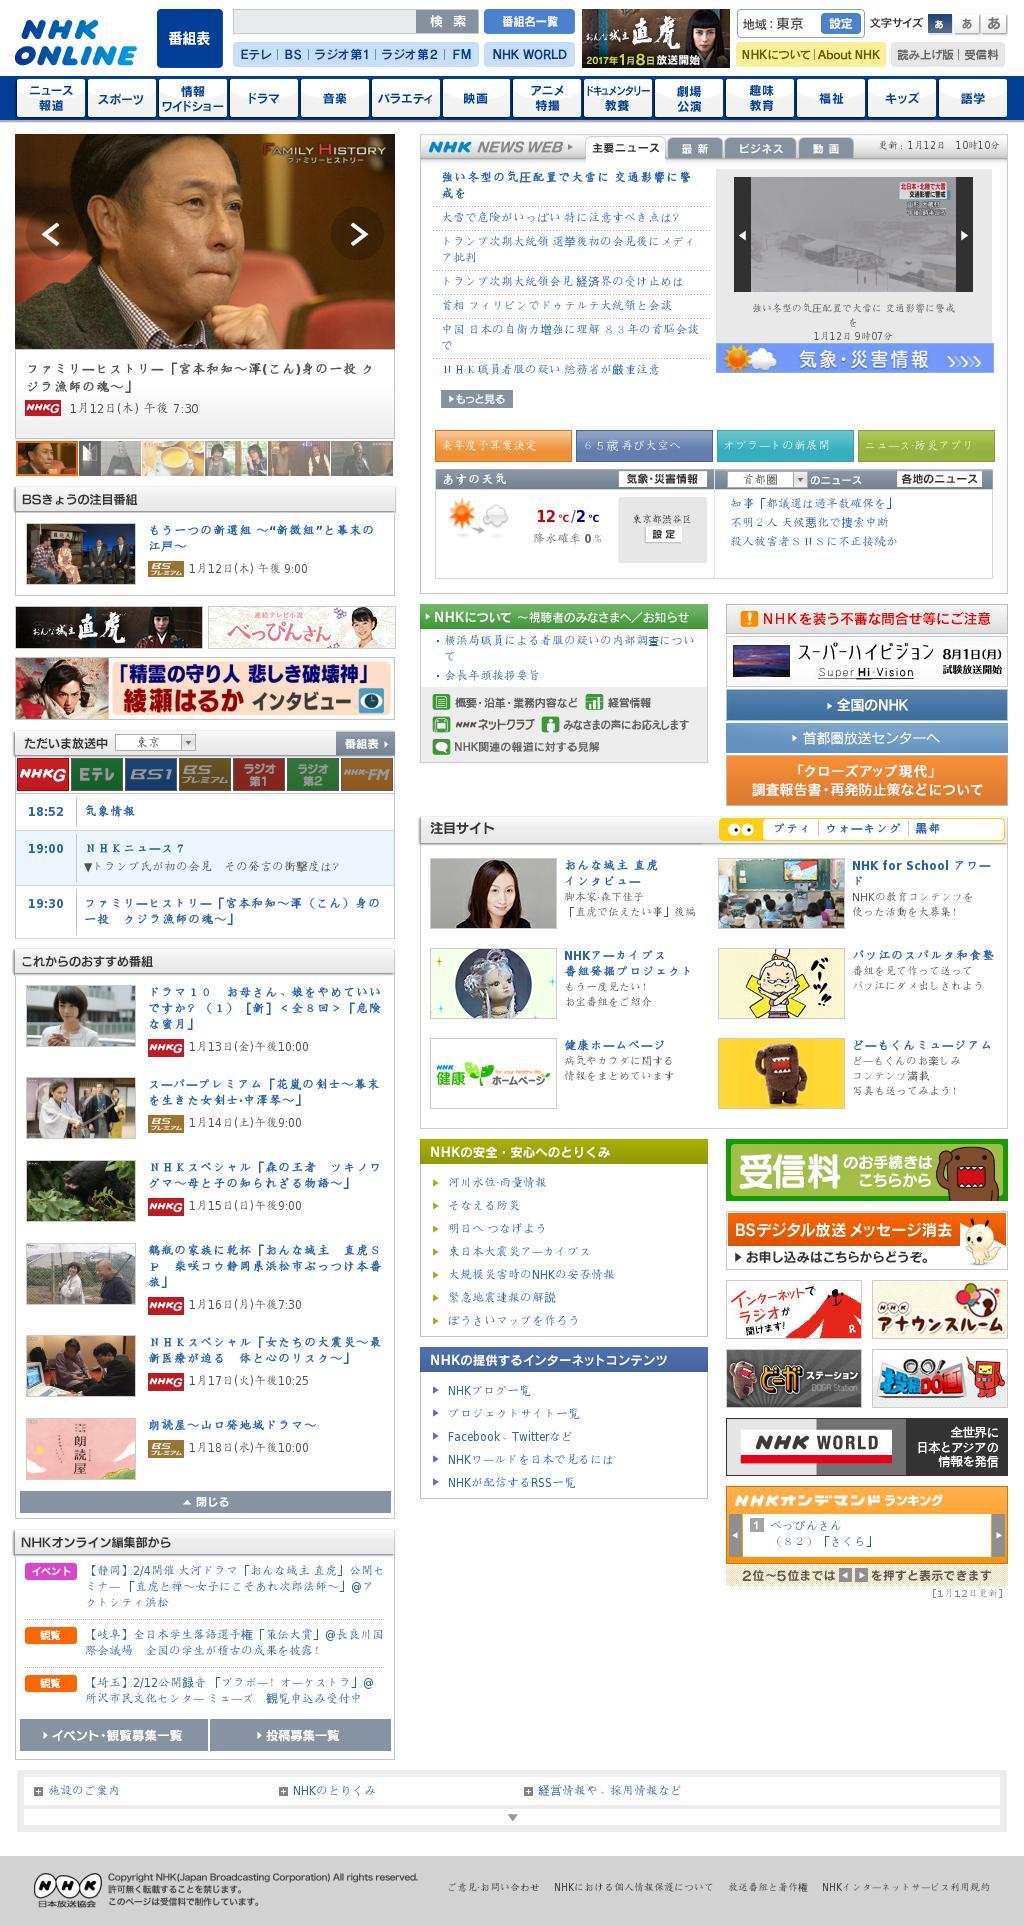 NHK Online at Thursday Jan. 12, 2017, 10:14 a.m. UTC